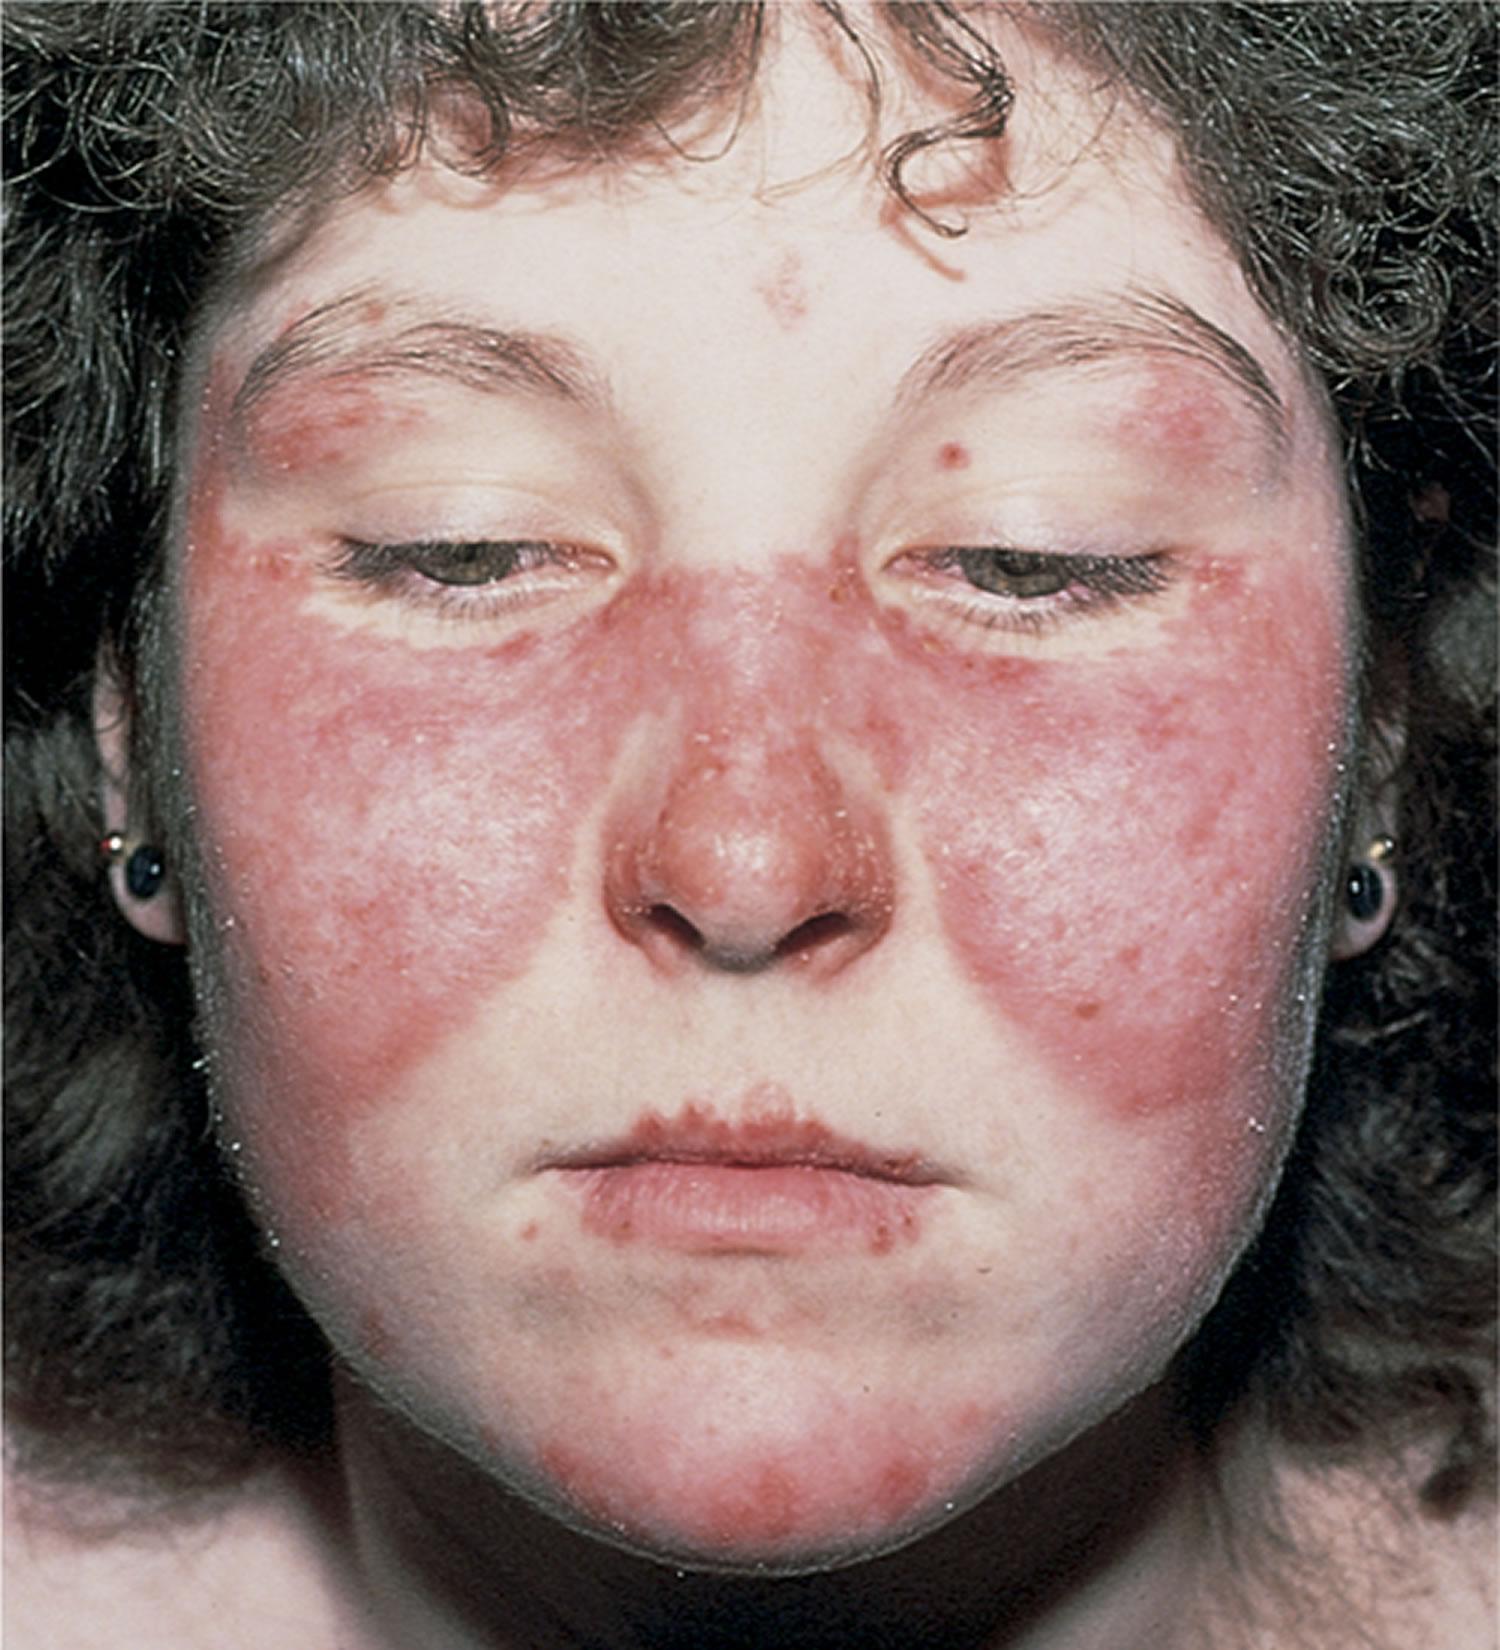 systemic lupus erythematosus butterfly rash